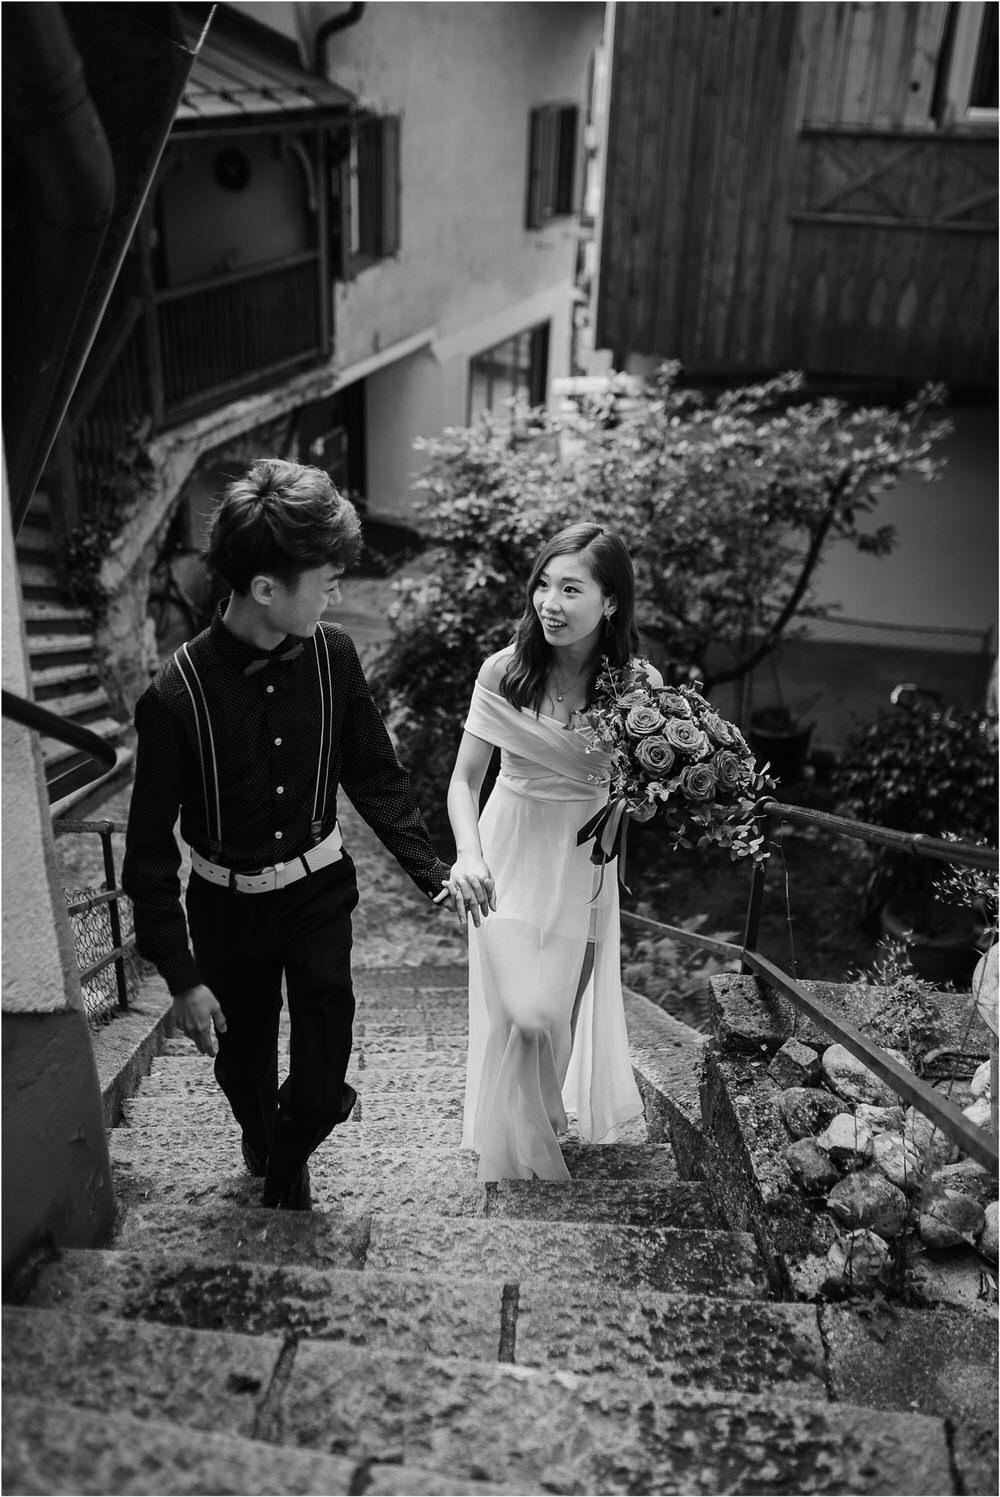 hallstatt austria wedding engagement photographer asian proposal surprise photography recommended nature professional 0016.jpg